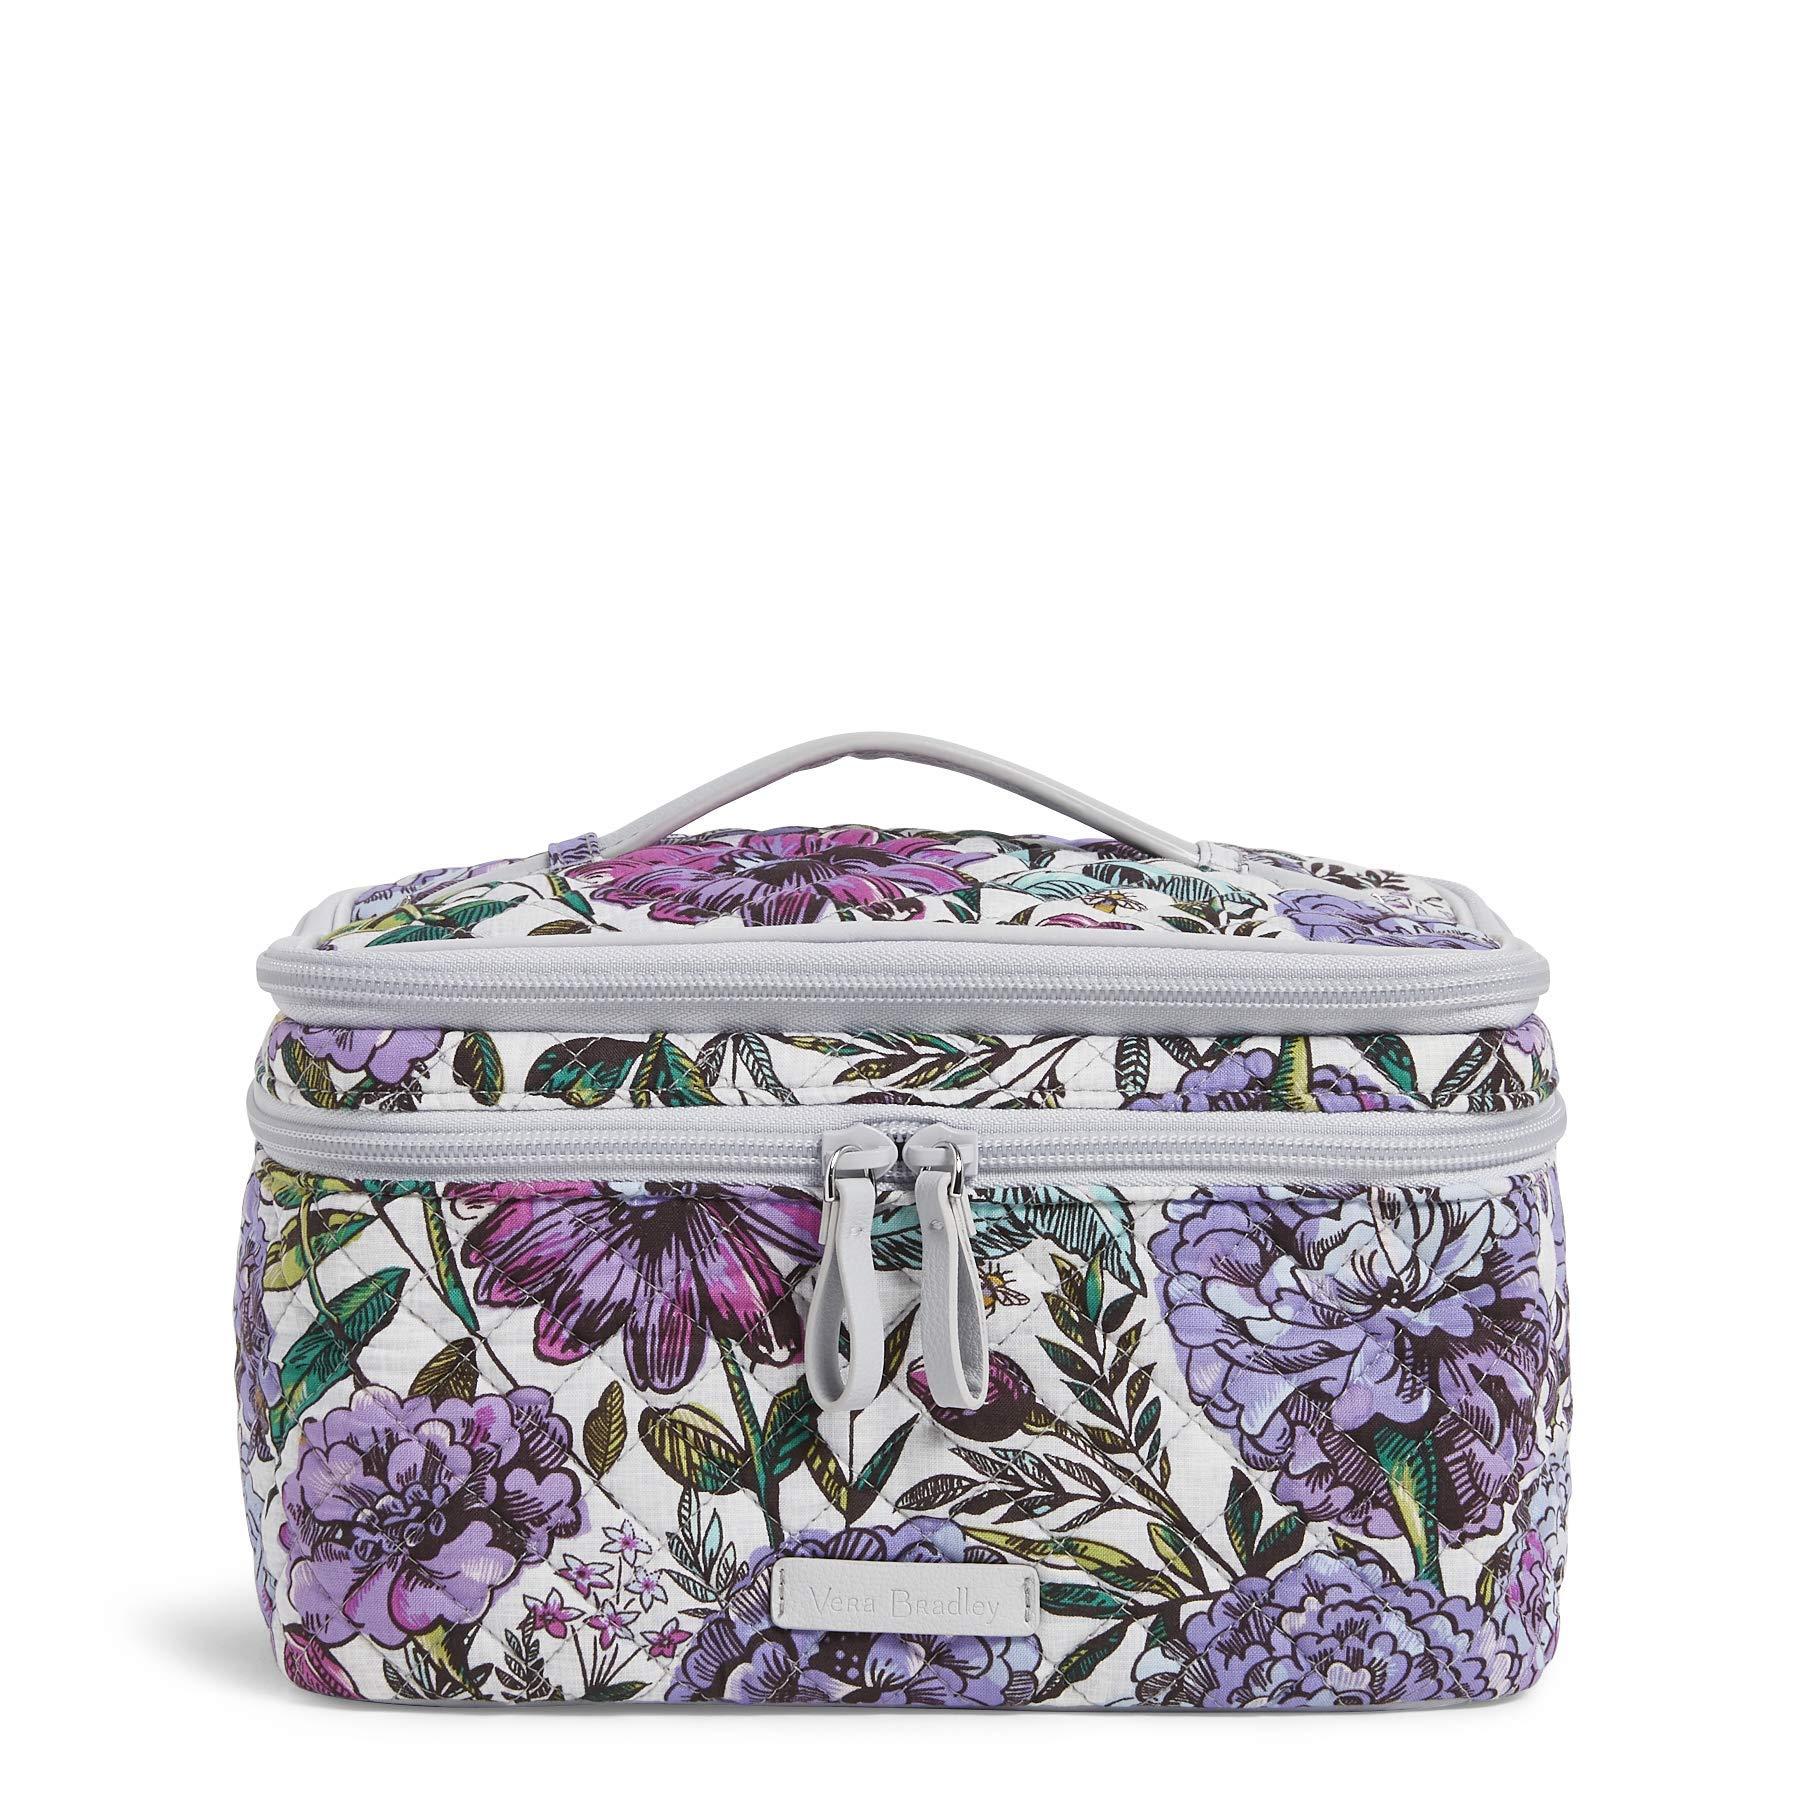 Vera Bradley Iconic Brush Up Cosmetic Case, Signature Cotton, Lavender Meadow